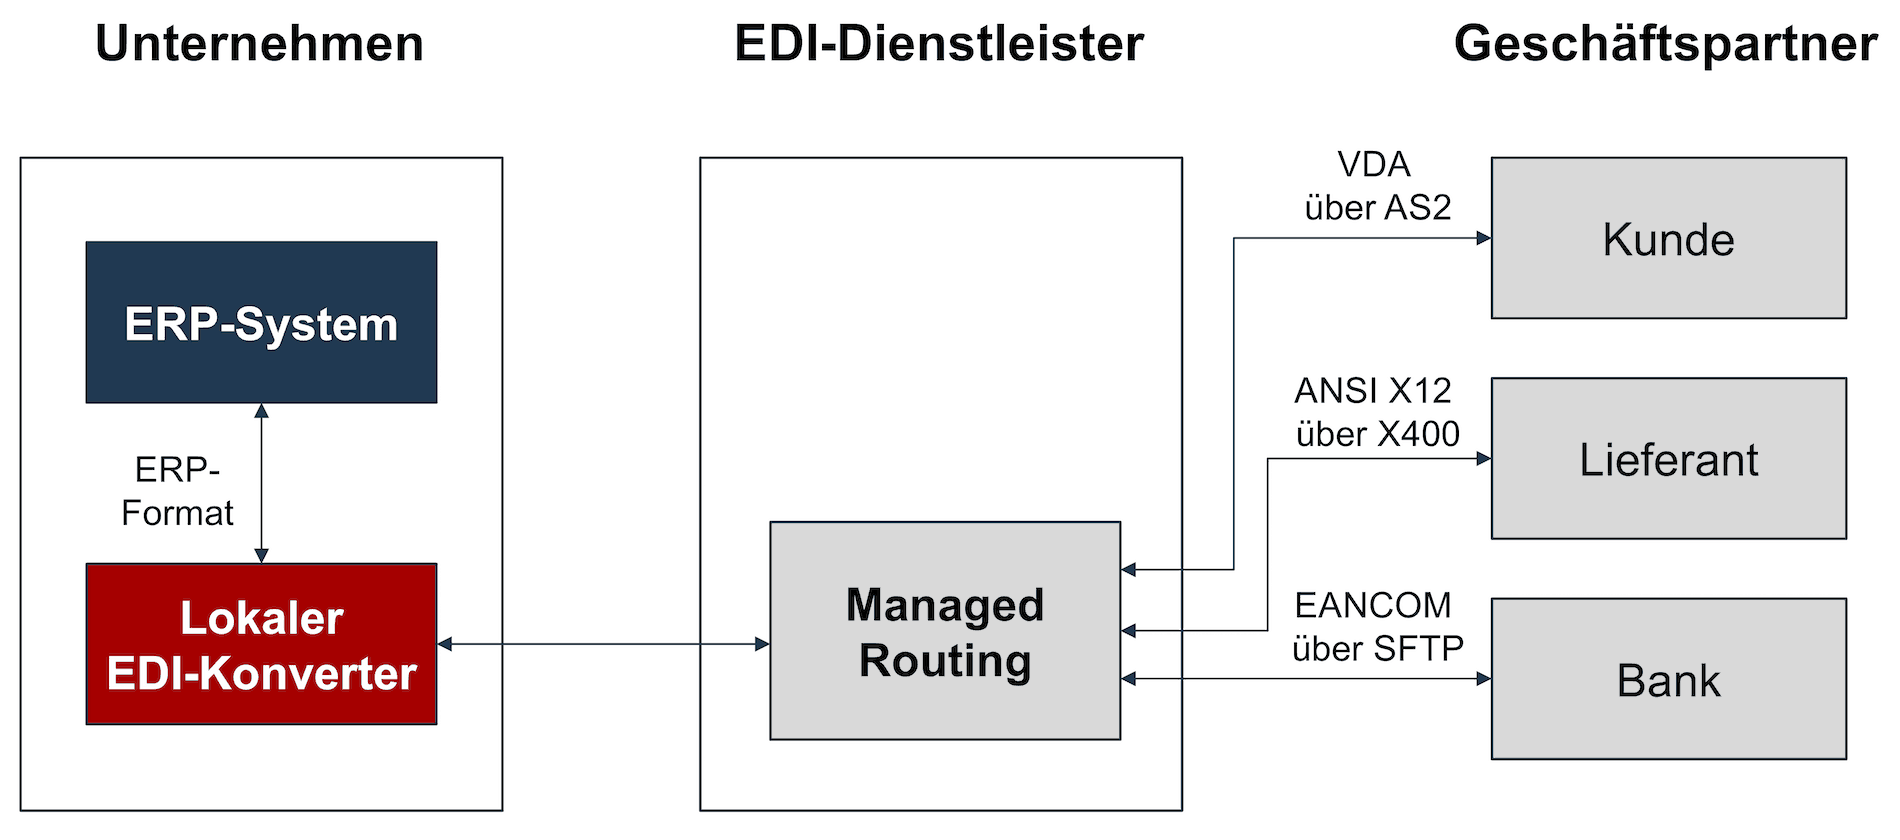 Lokaler EDI-Konverter mit EDI-Dienstleister